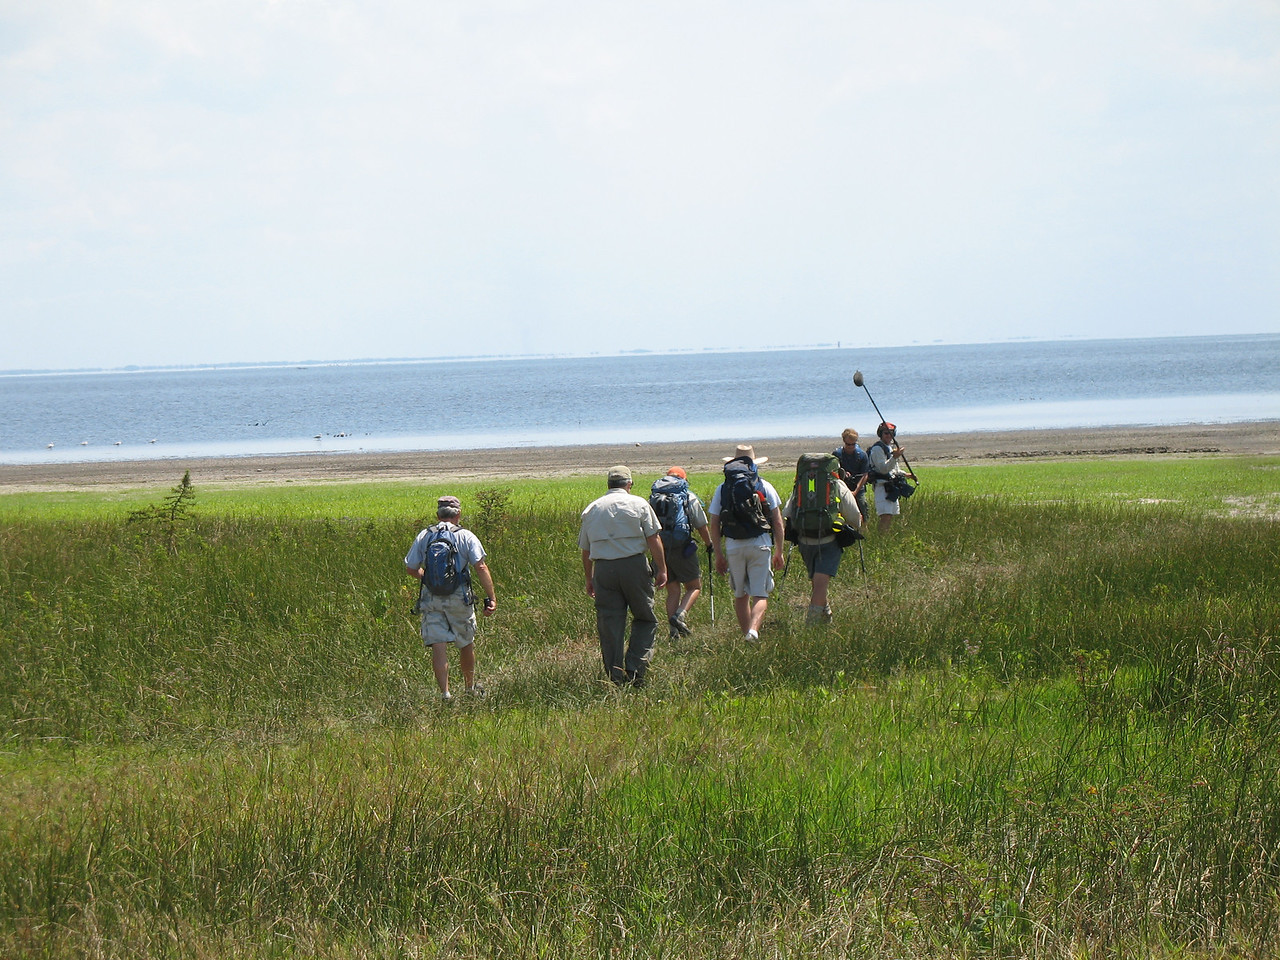 Heading through the grassy shoreline to the lake's receded shoreline